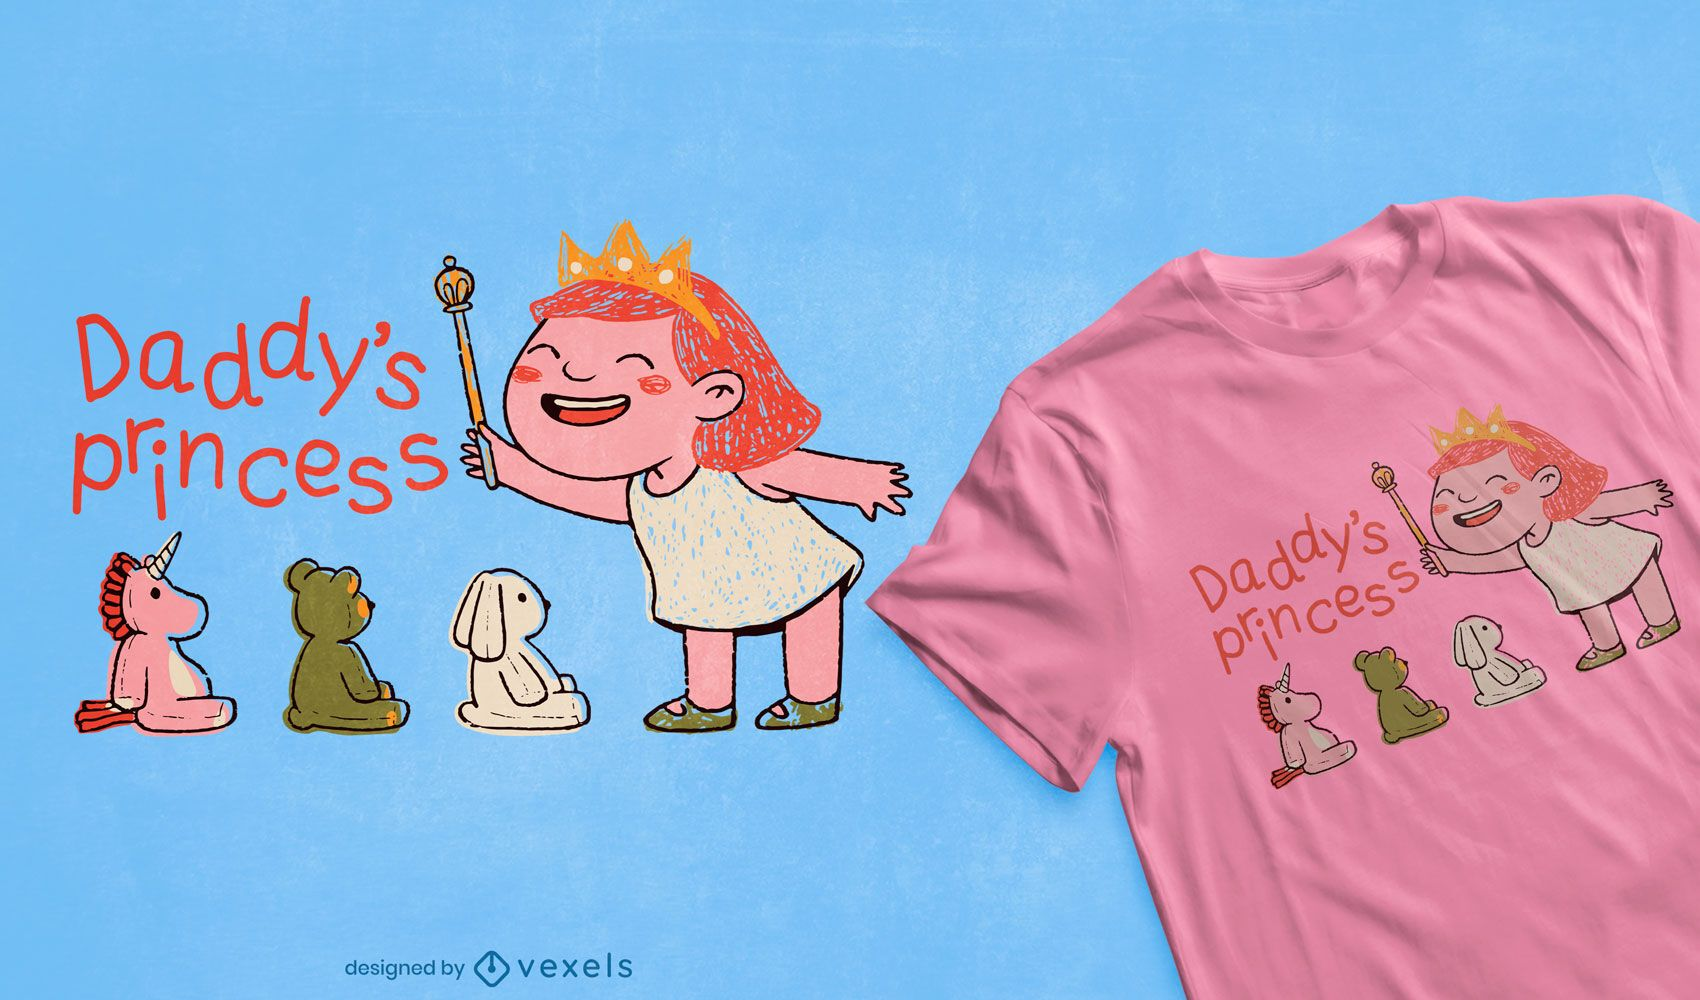 Daddy's princess t-shirt design